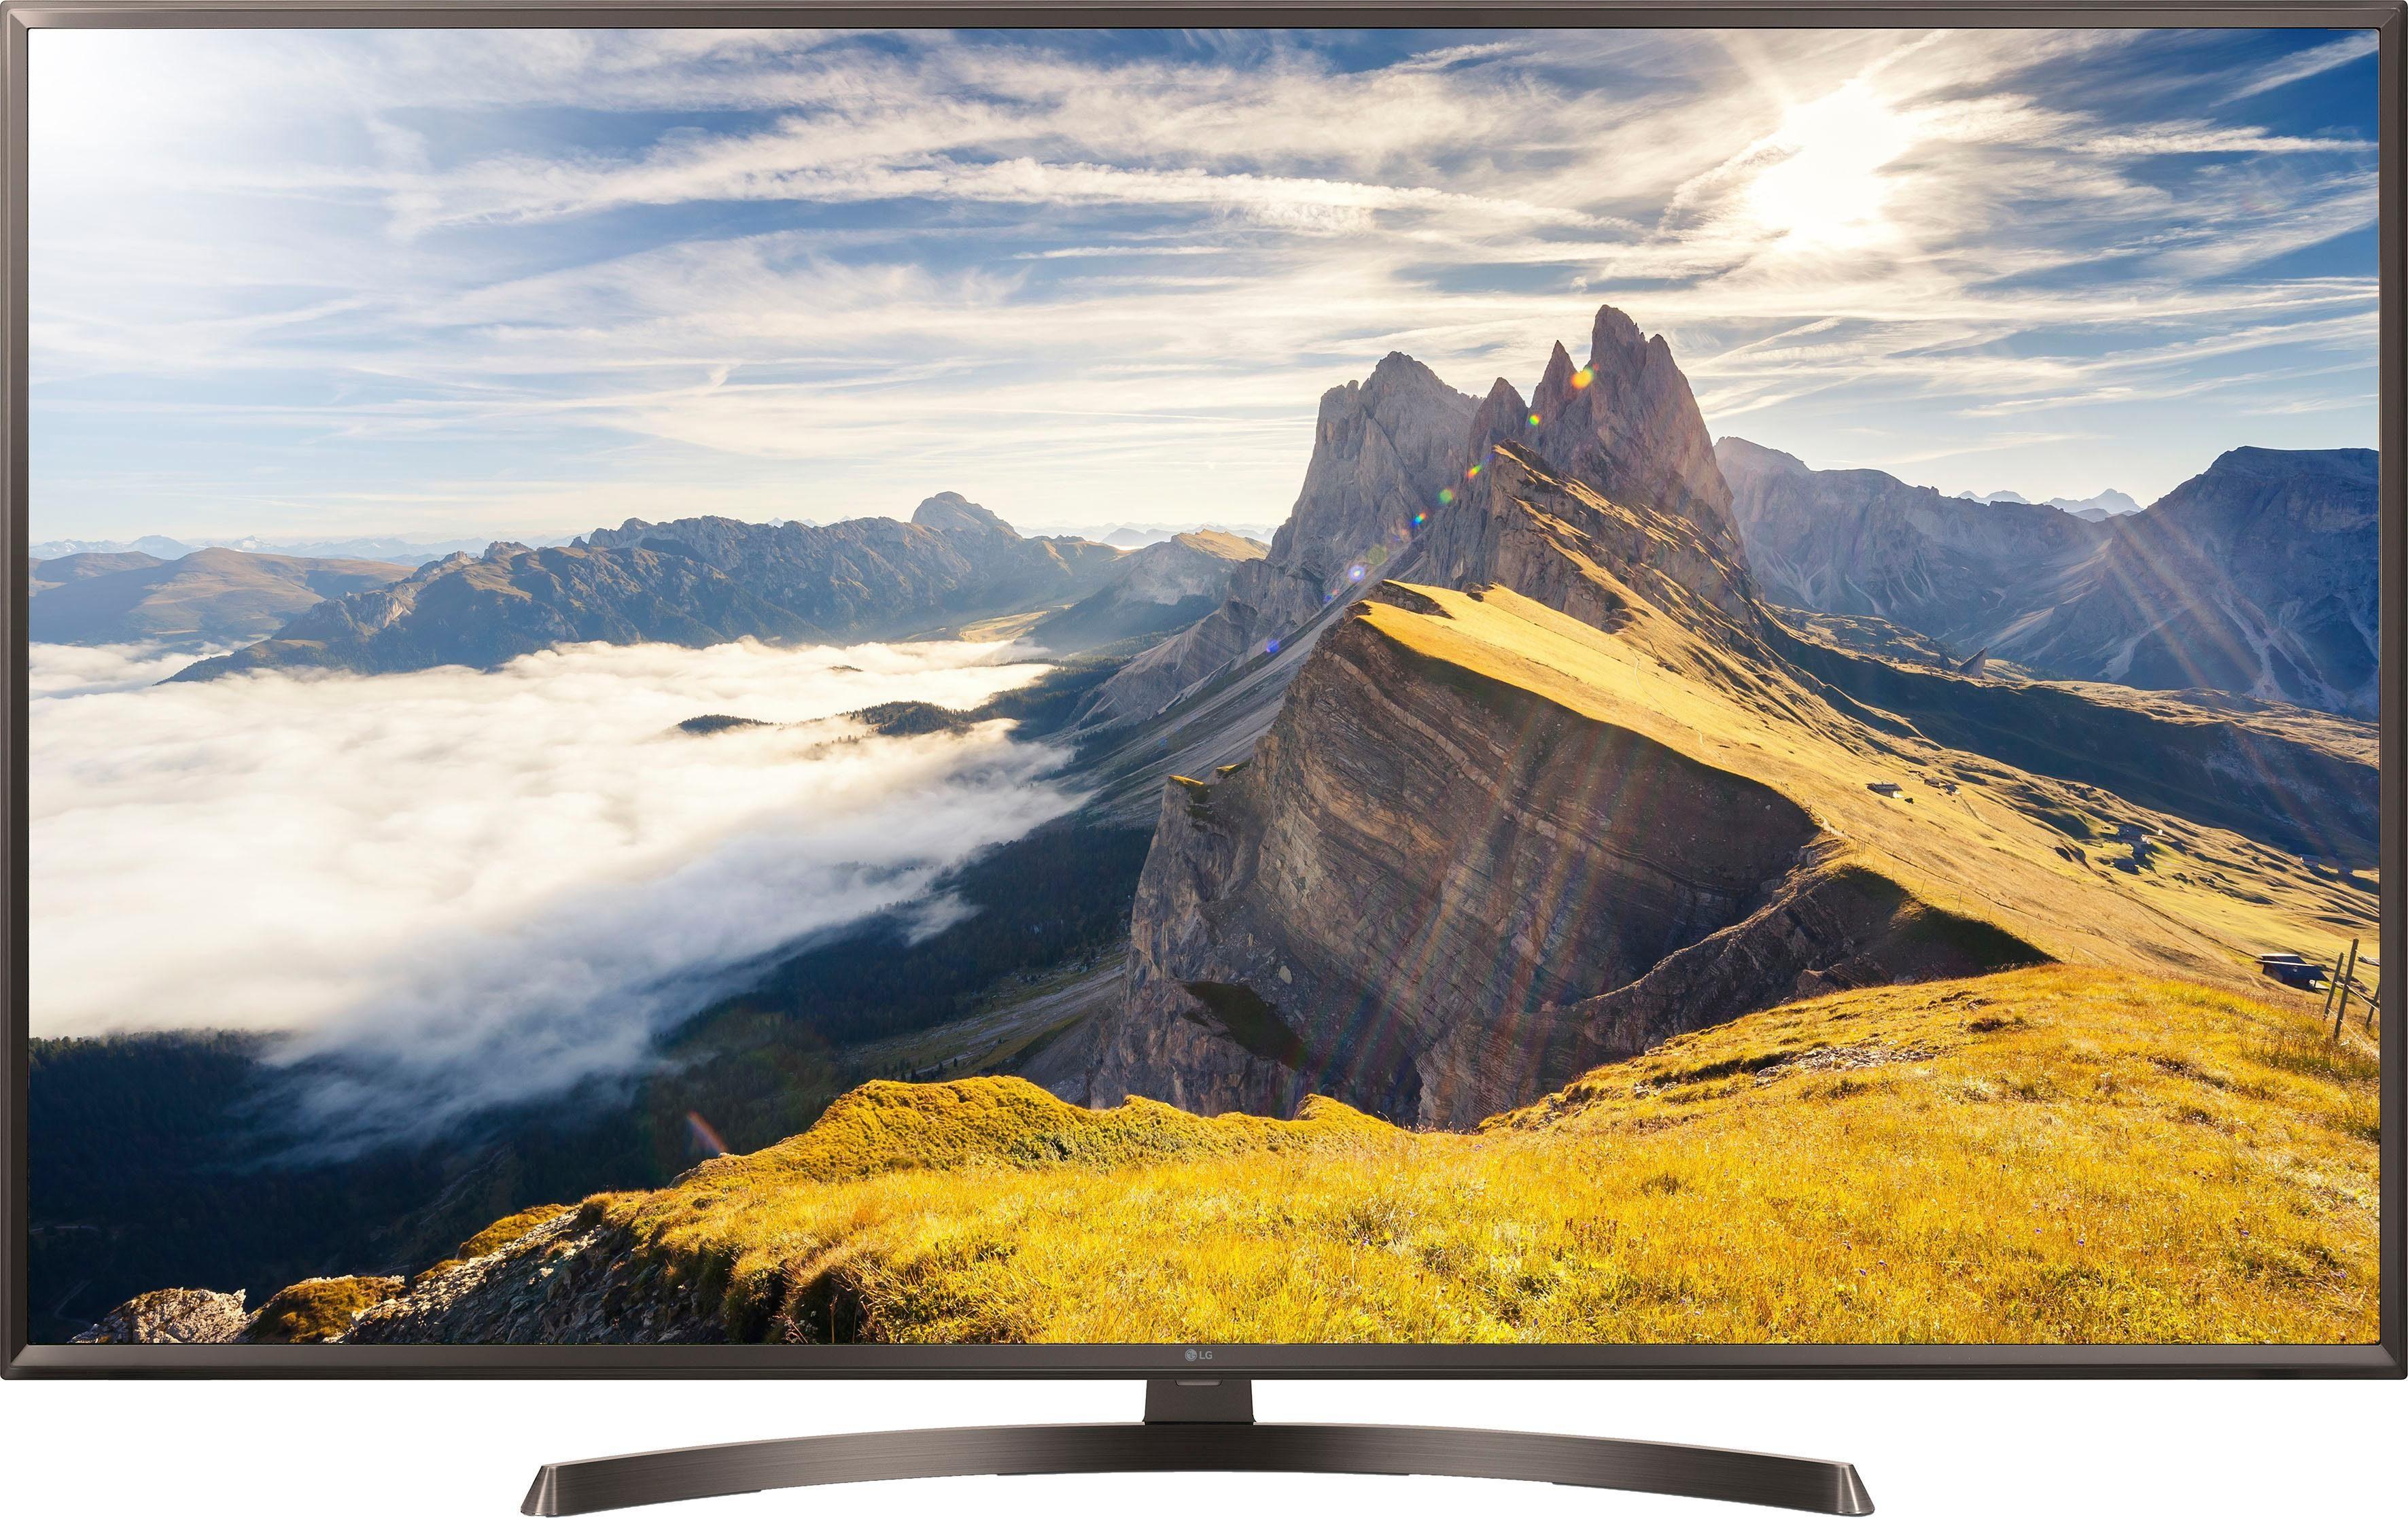 LG 55UK6400PLF LED-Fernseher (55 Zoll, 4K Ultra HD, Smart-TV)